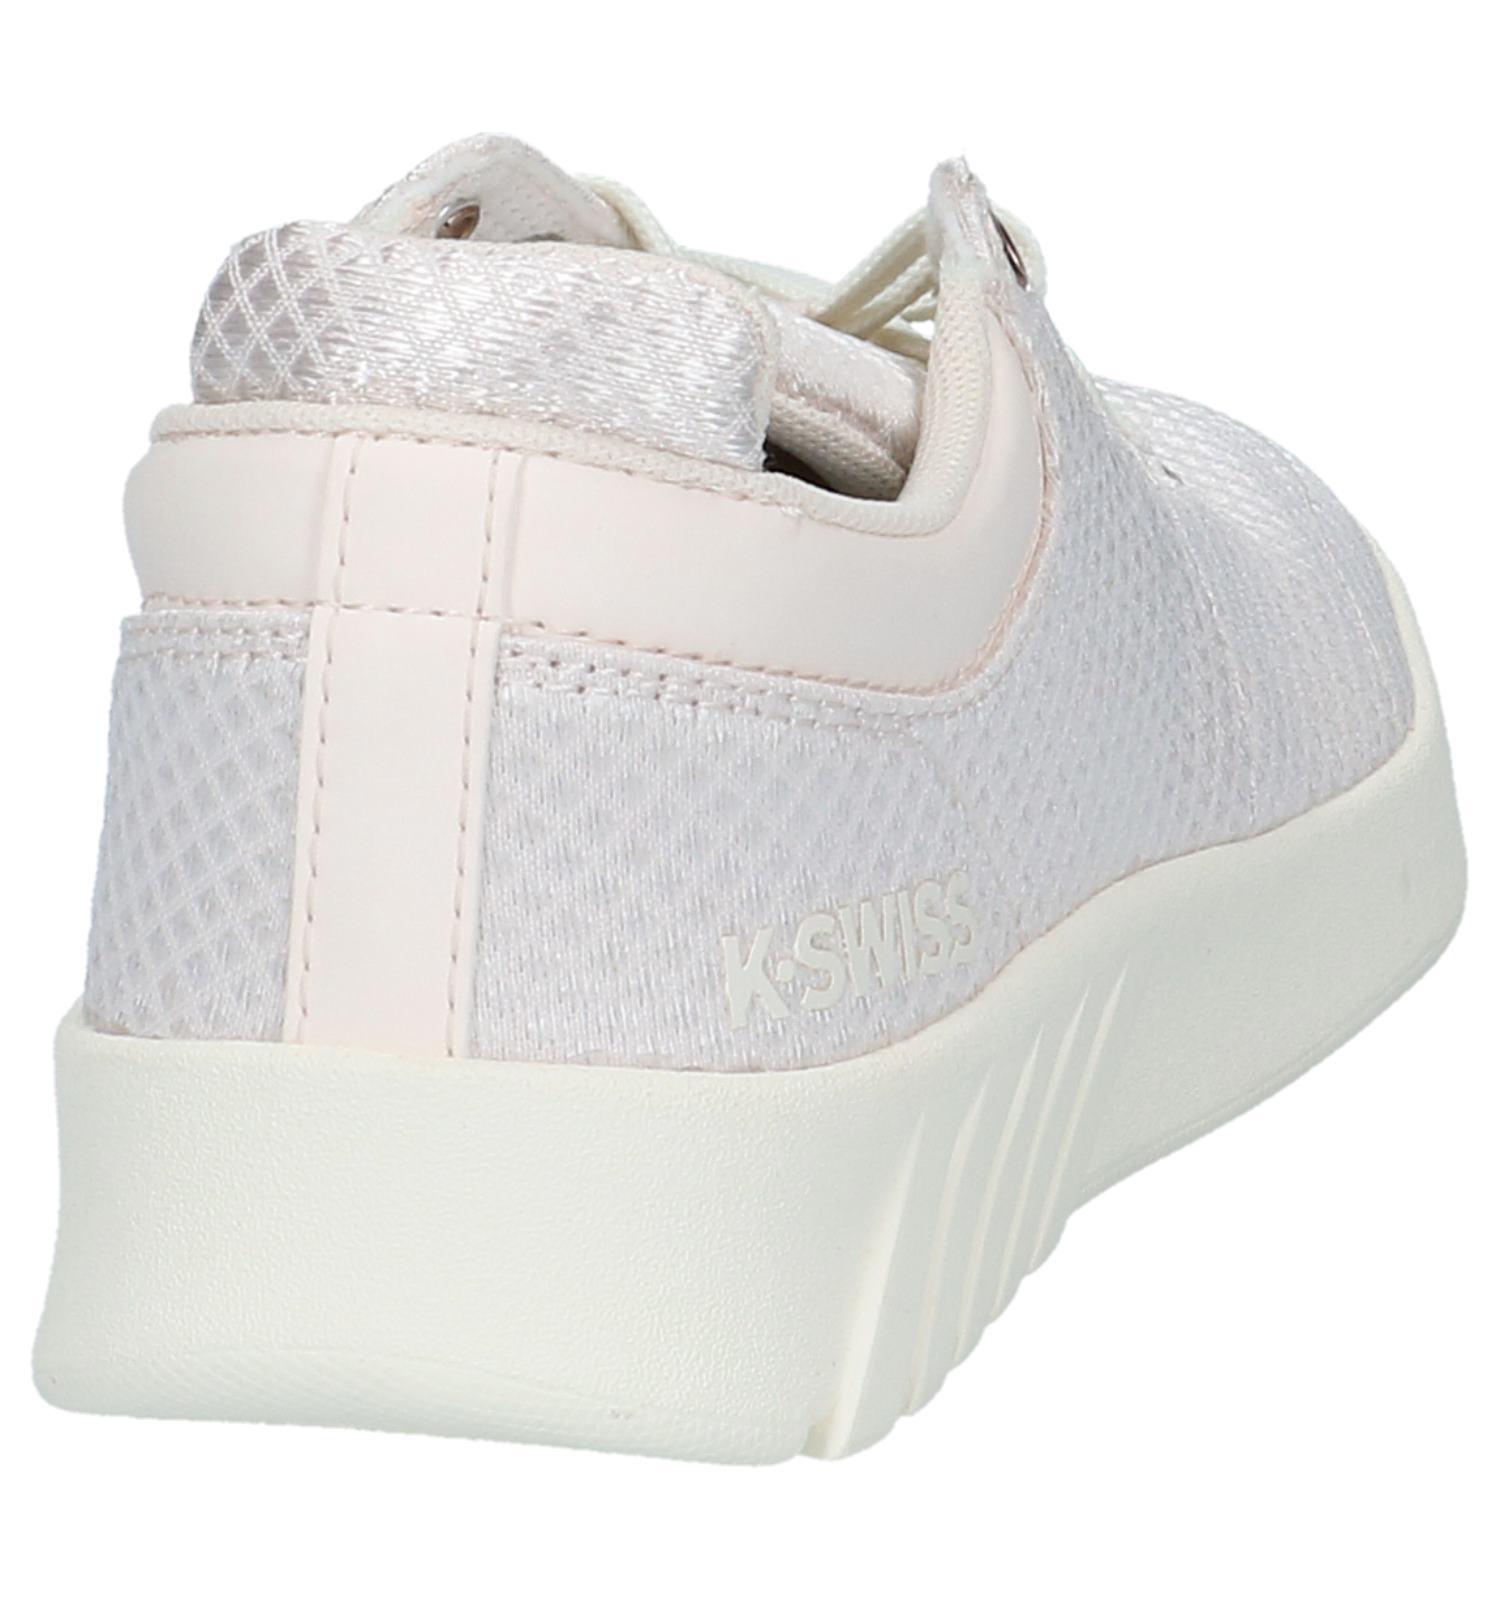 c421da4afbb K-Swiss Aero Trainer Rose Gold Sneakers